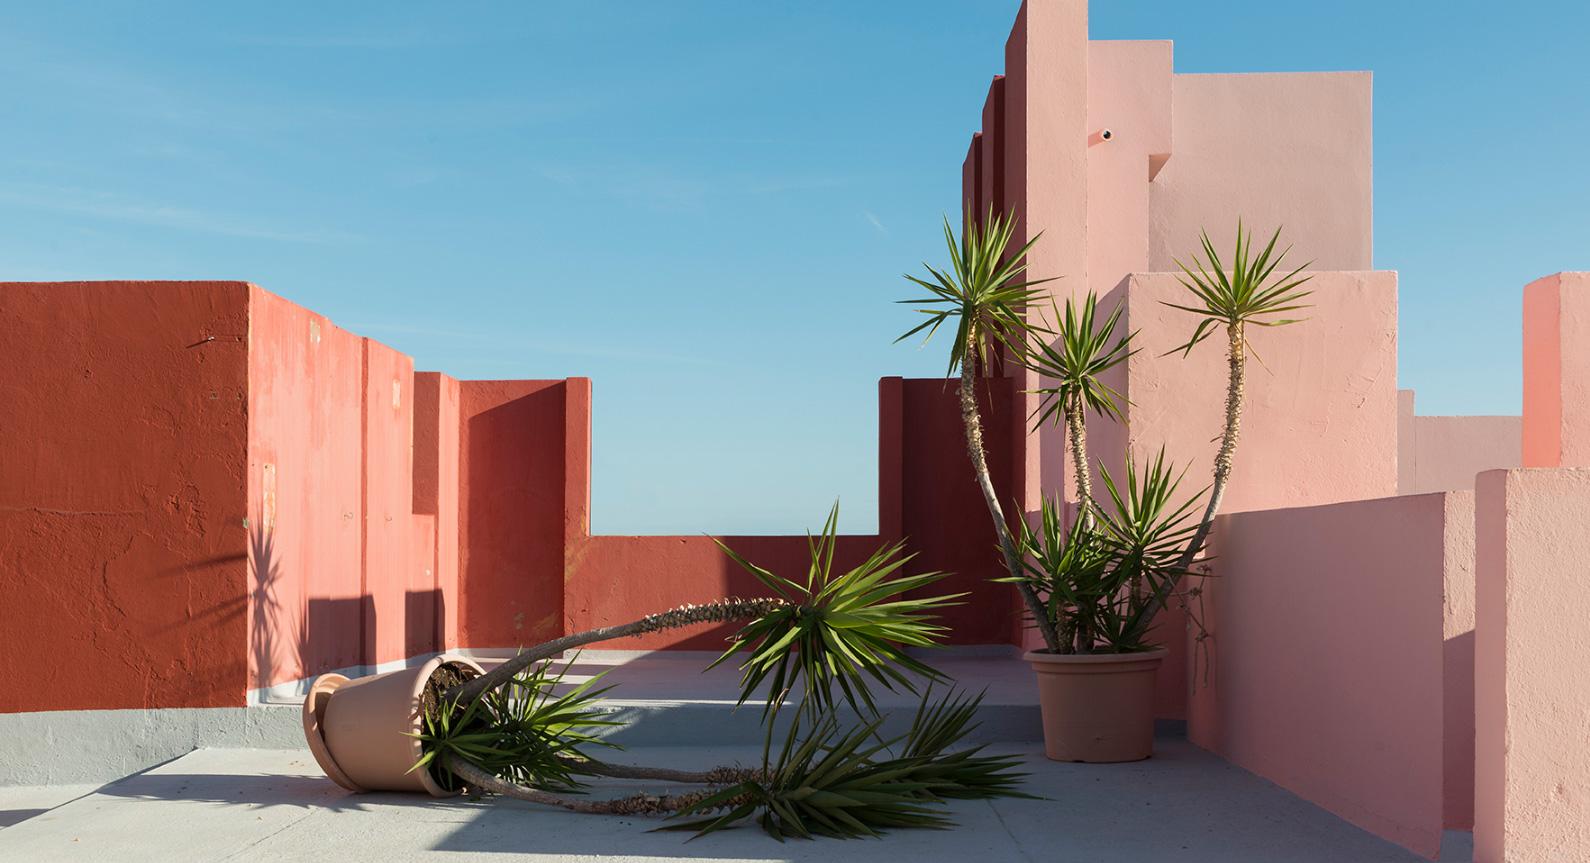 Andres Gallardo's Images Reveal The Fantasy That Is La Muralla Roja